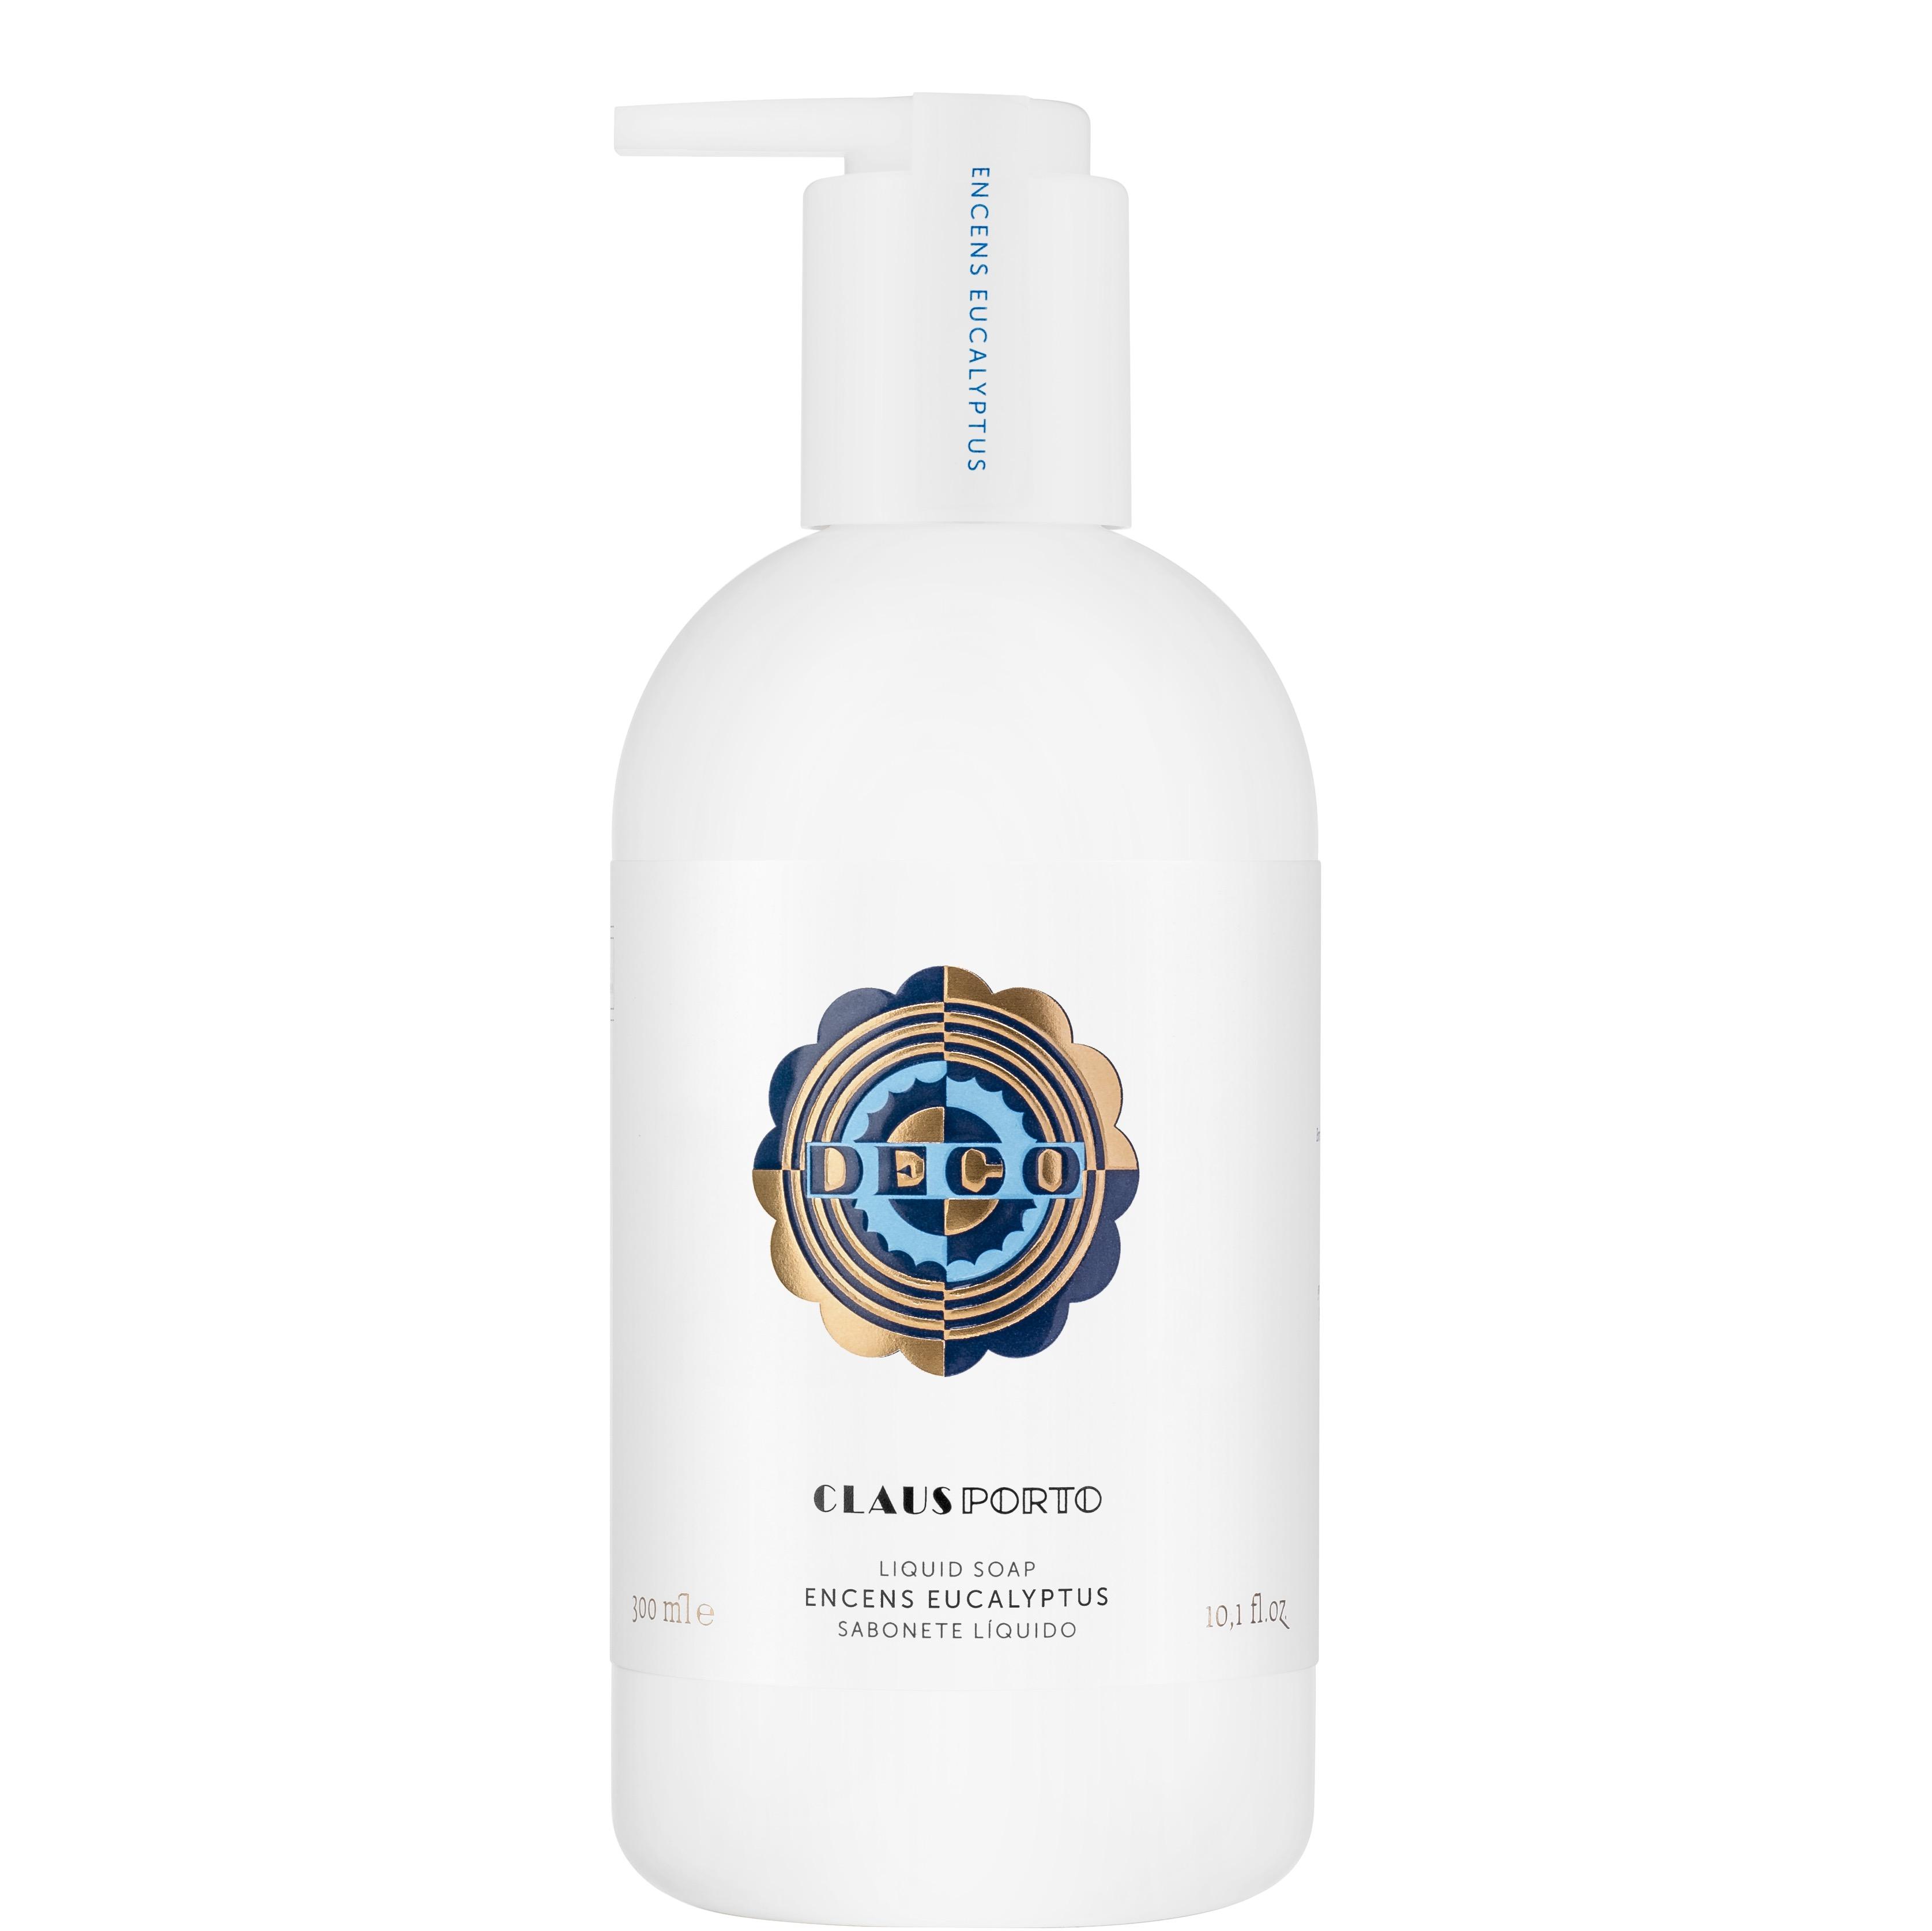 Hand & Body Wash - Deco / Eucalyptus